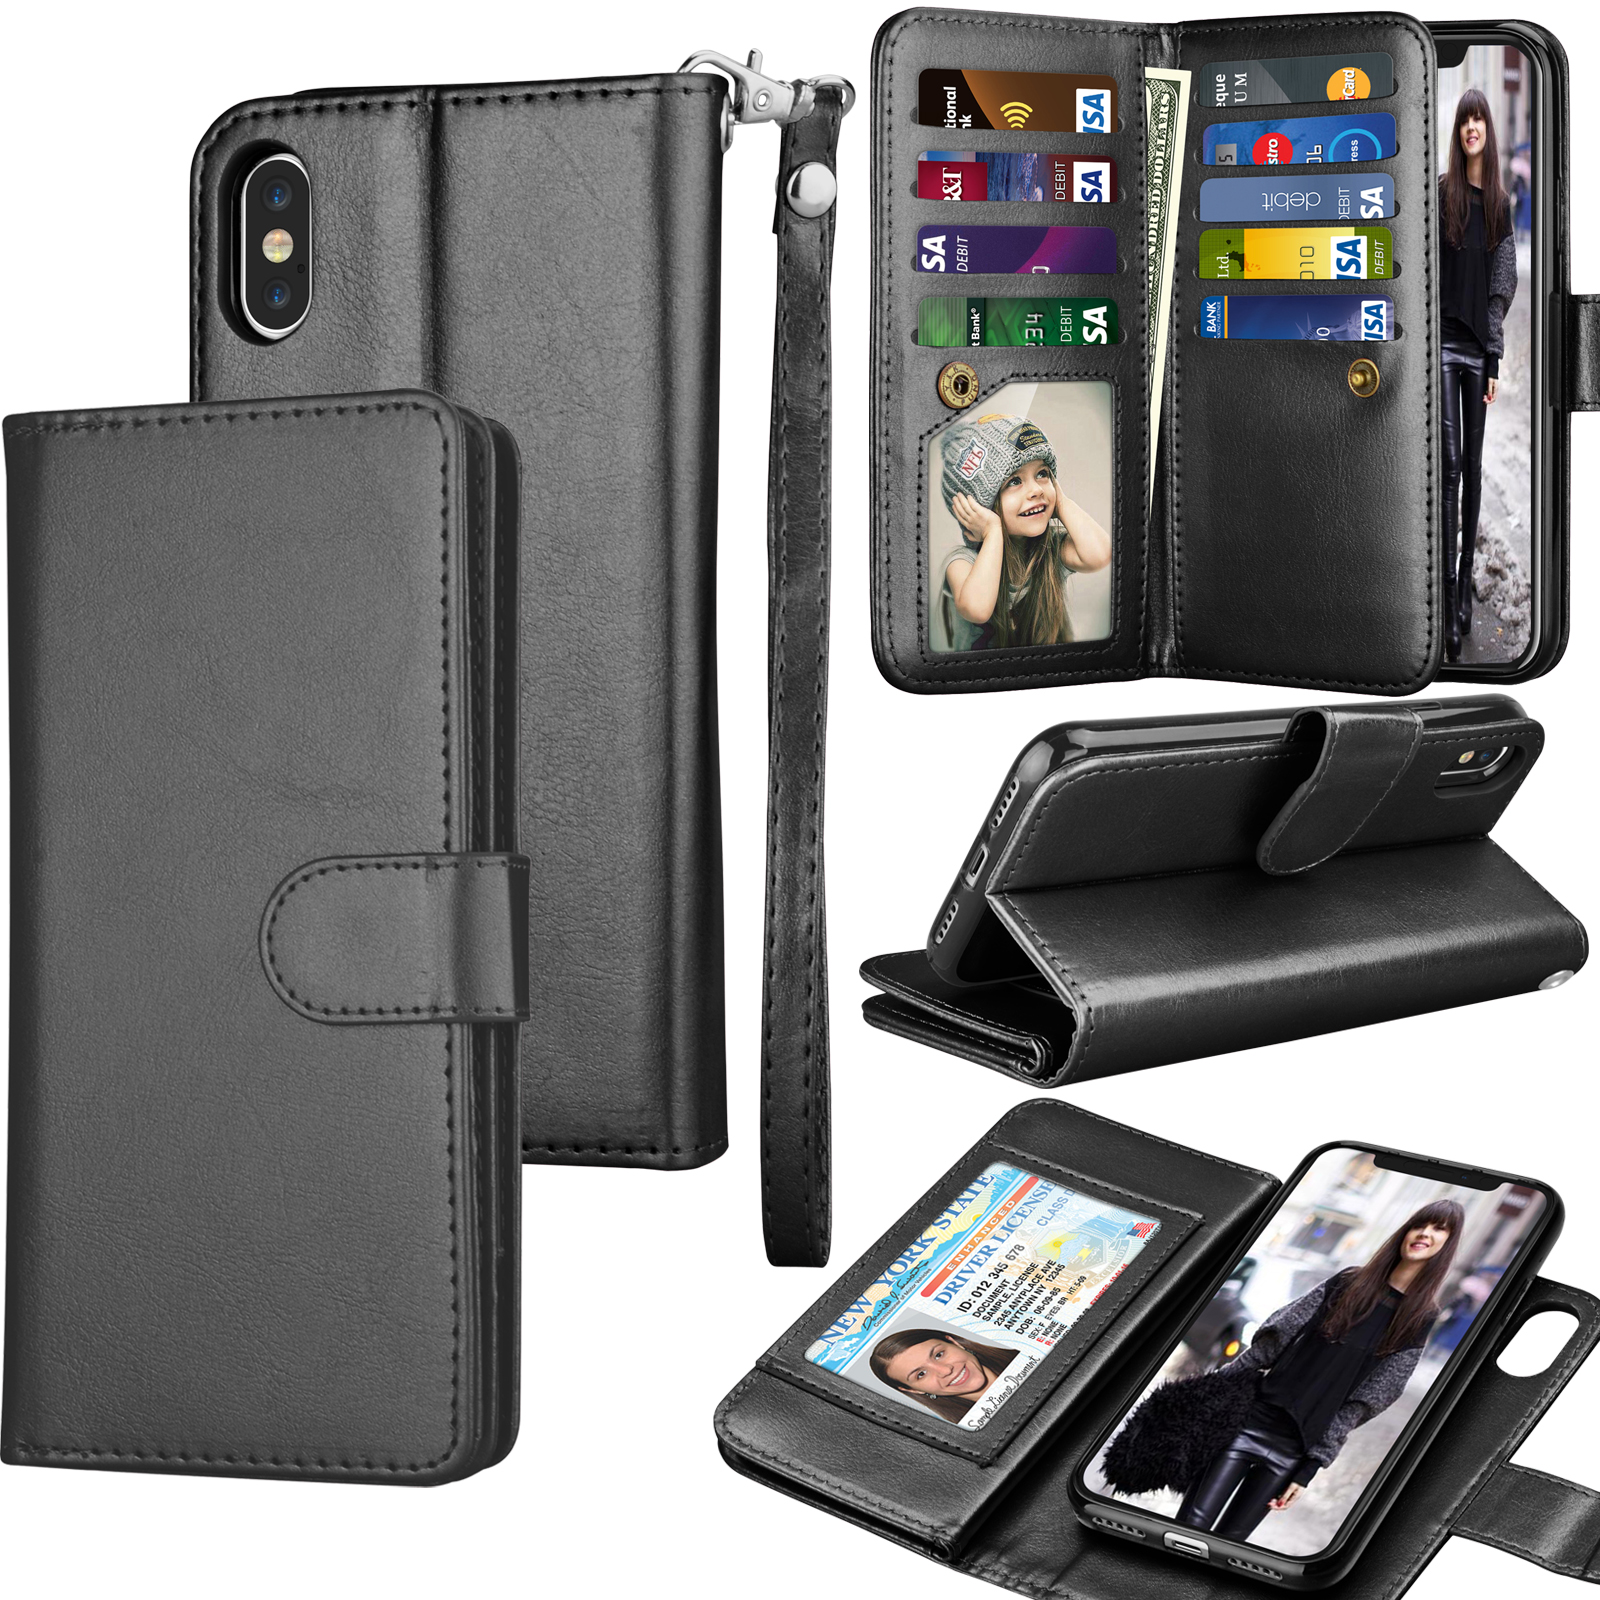 iPhone X Case, iPhone X Wallet Case,iPhone X PU Leather Case, Tekcoo Luxury [Black] License Cash Credit Card Slots Holder Carrying Flip Cover [Detachable Magnetic Hard Case] & Kickstand + Lanyard